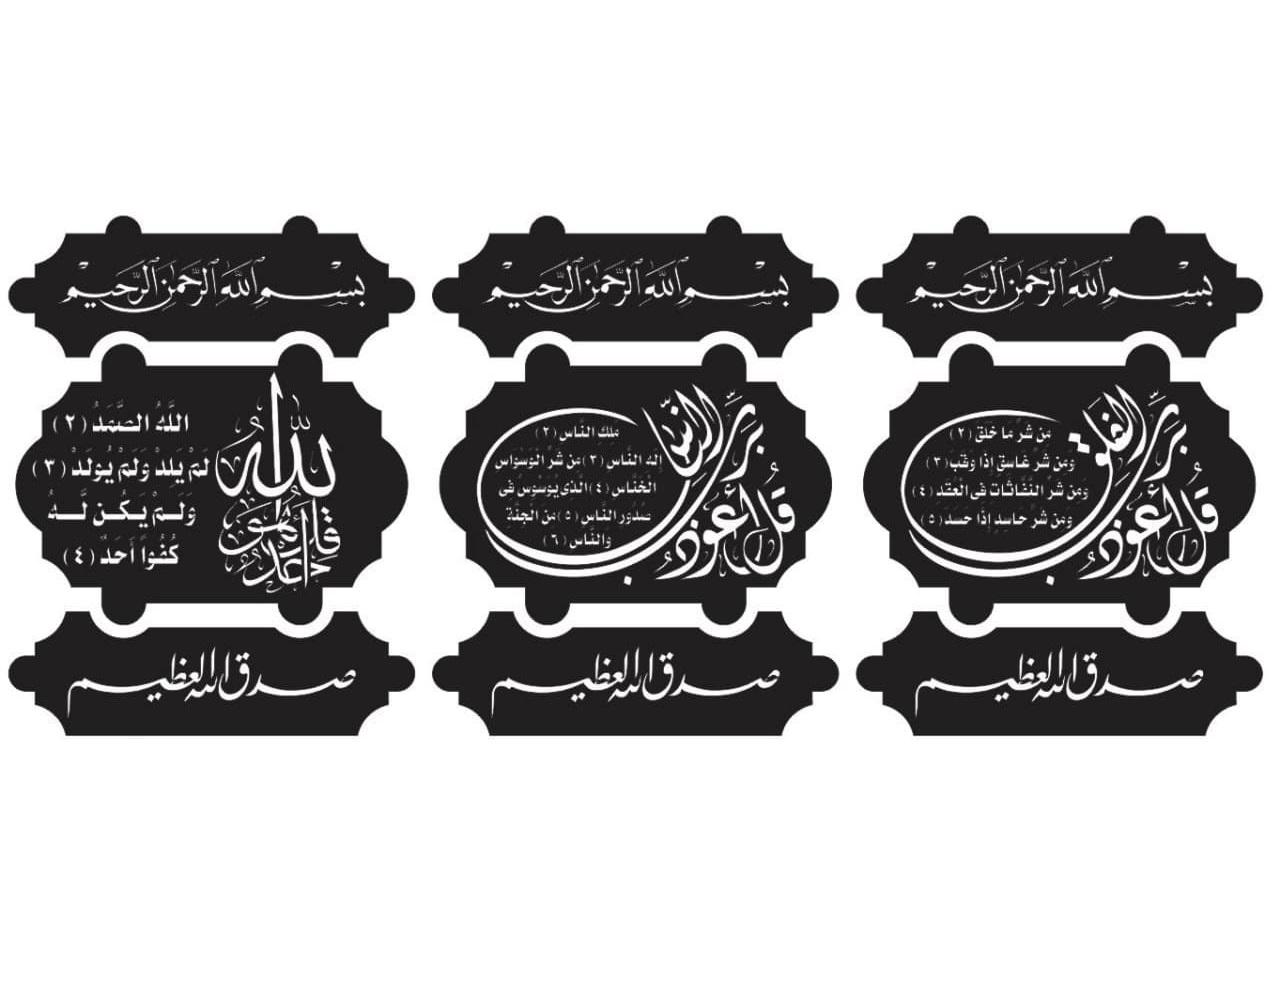 Arabic Islamic Calligraphy Art DXF File